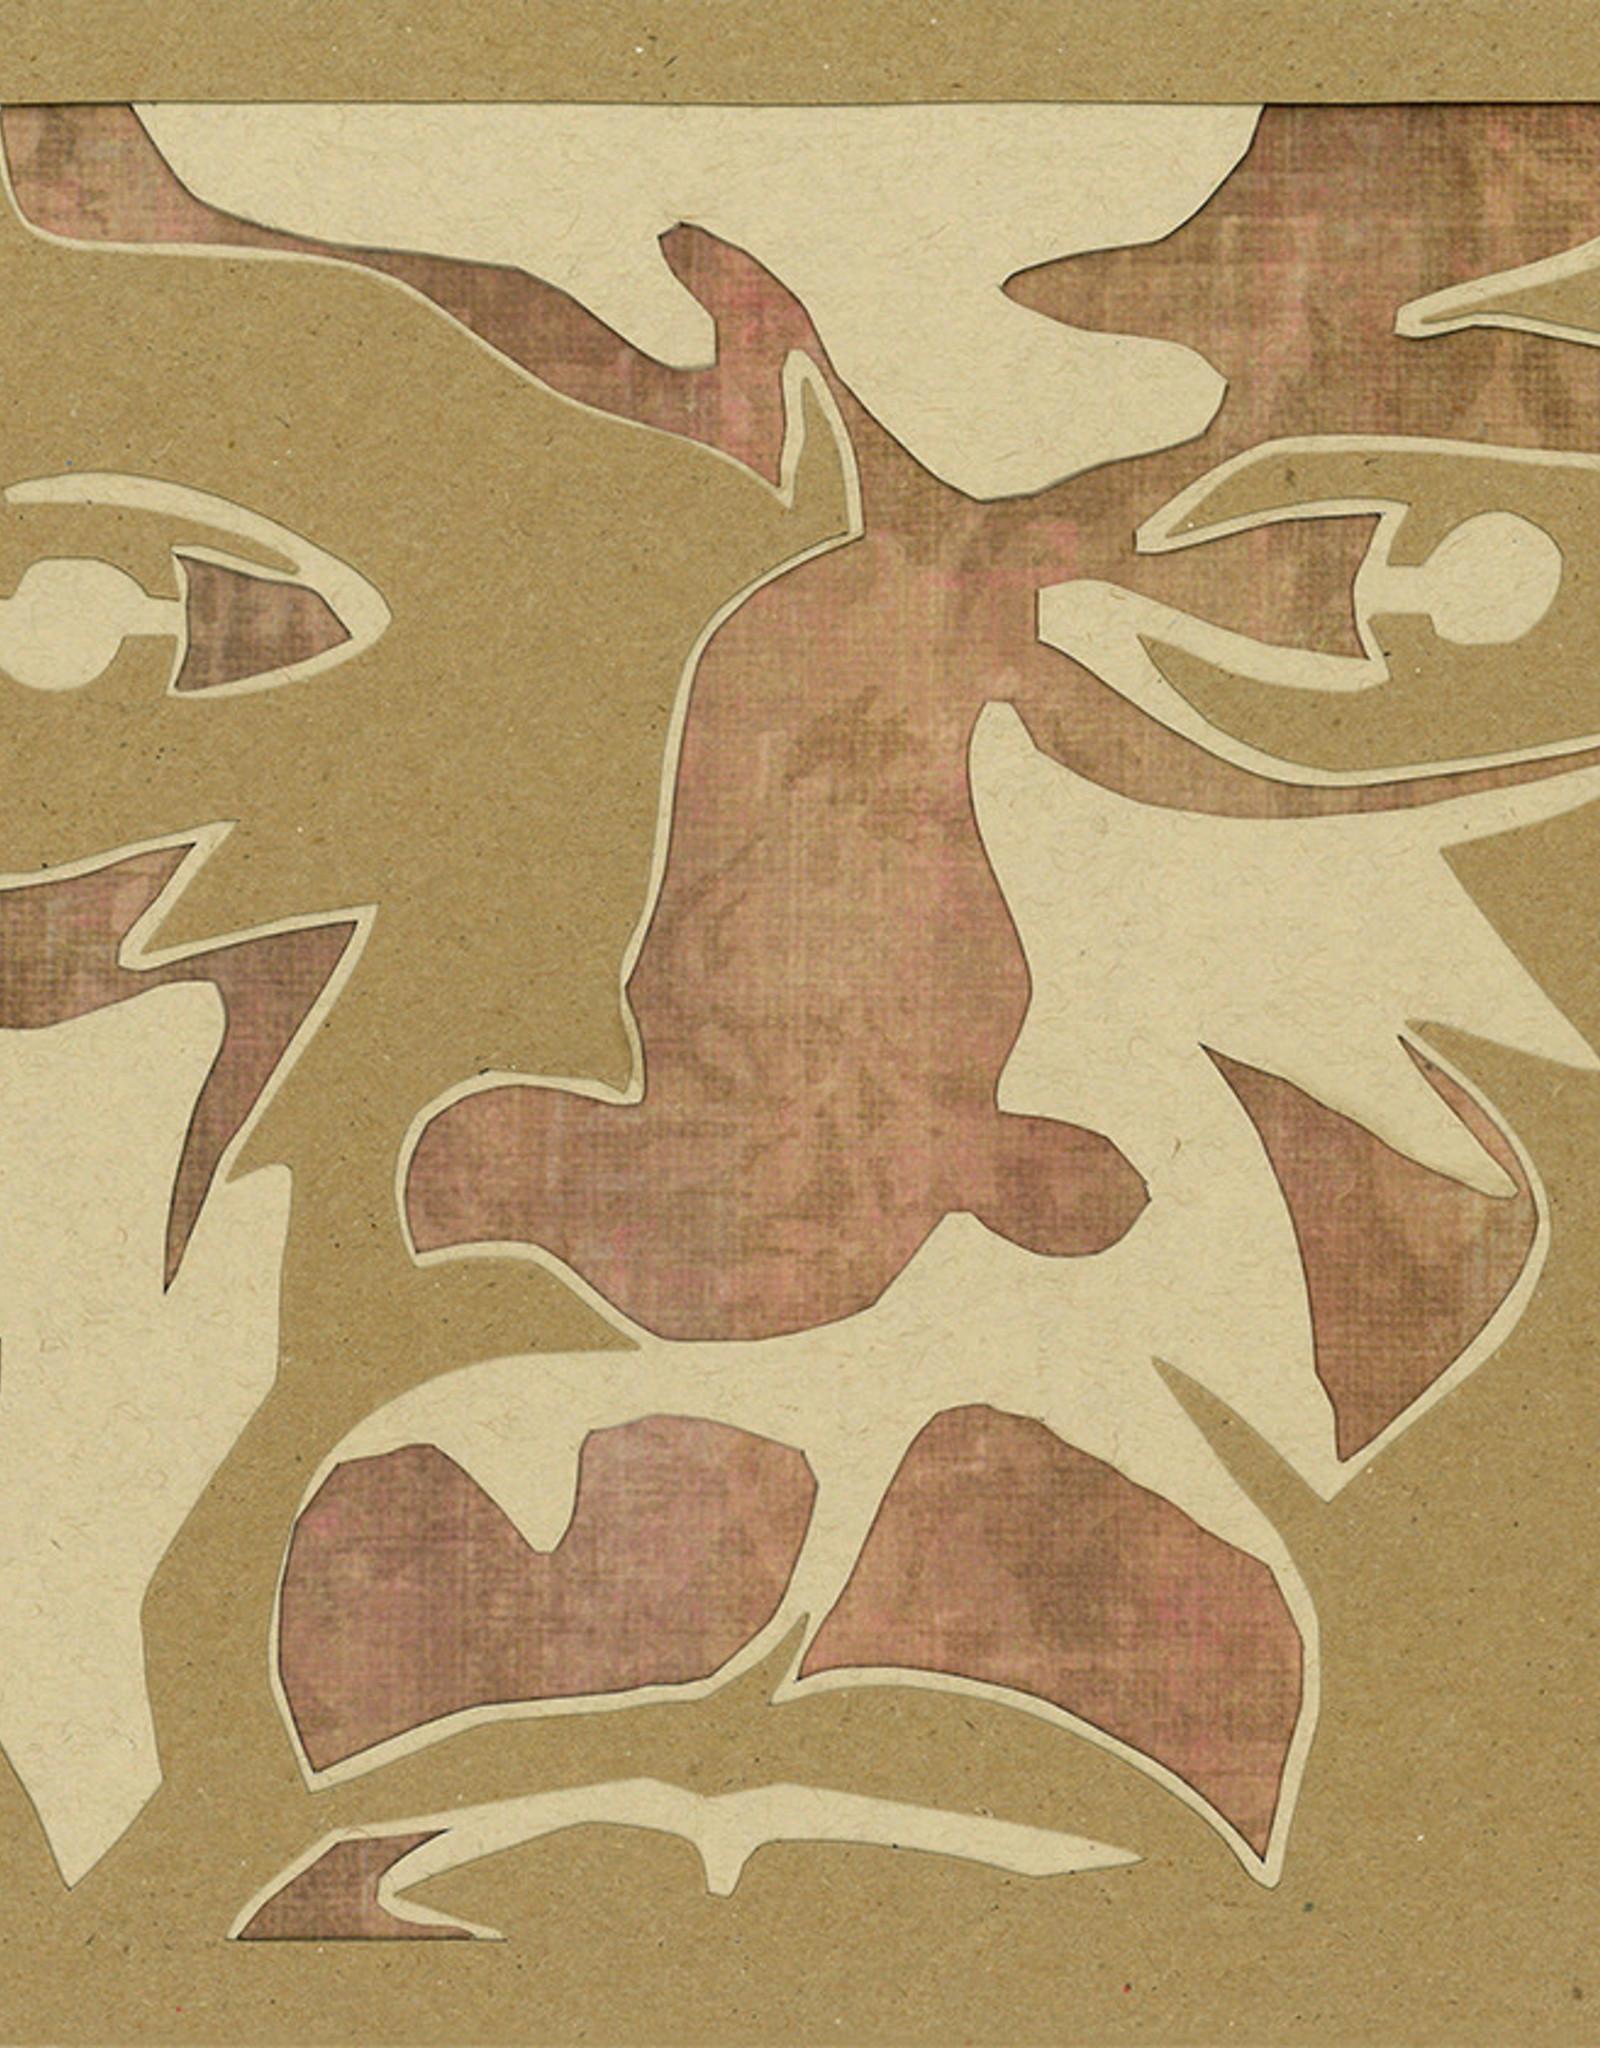 Gray Jones Face to Face -Cutout 9x12 #10